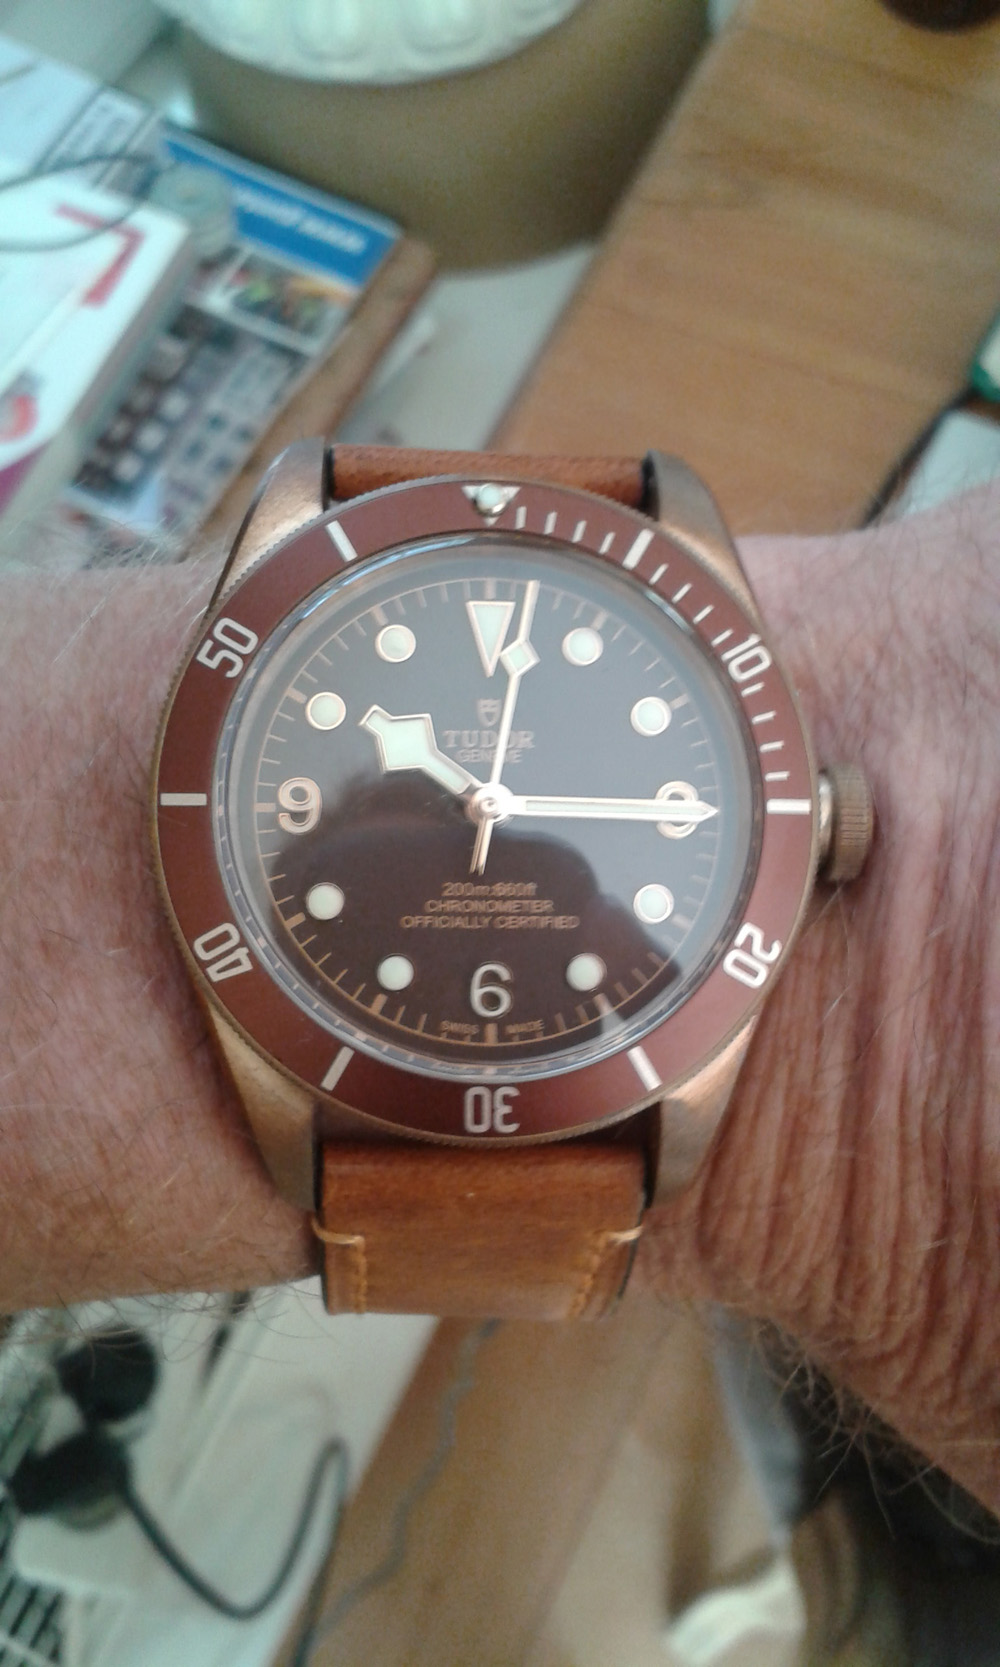 Tudor watch on wrist